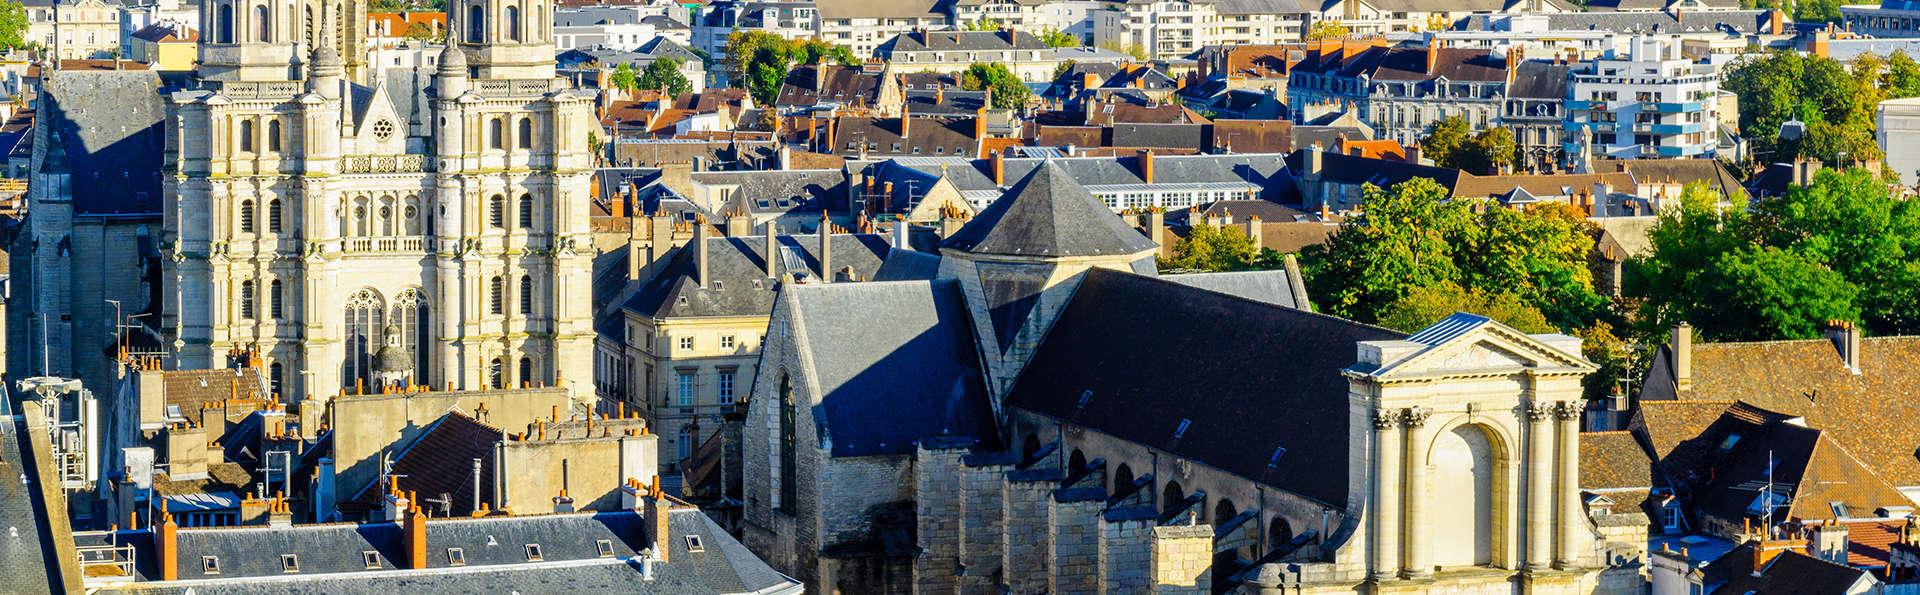 NOVOTEL DIJON ROUTE DES GRAND CRUS  - Edit_Dijon.jpg